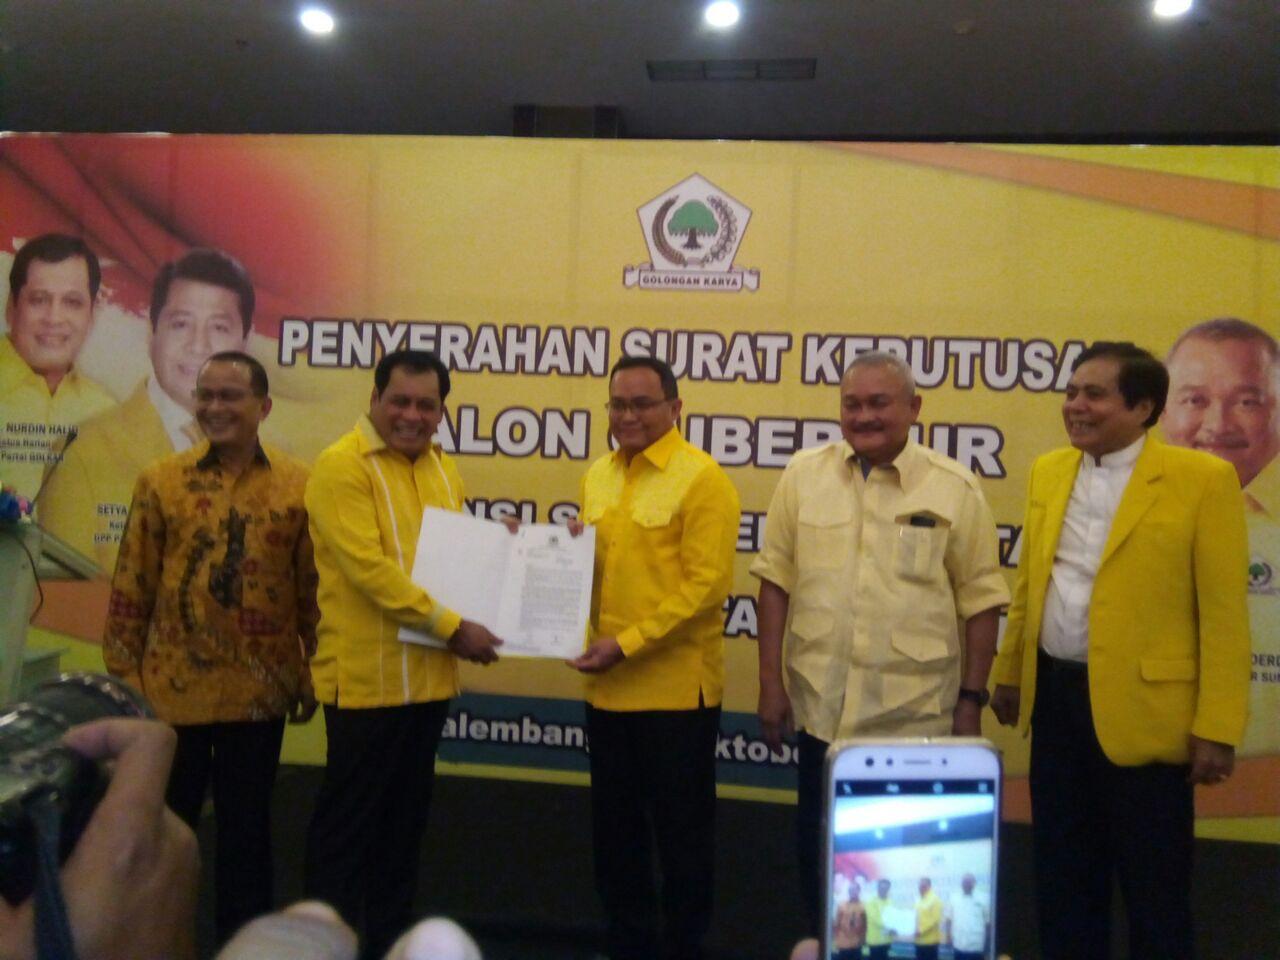 Jadi Kandidat Terkuat, Dodi Reza Tunggu Restu Ayahanda Untuk Pimpin Golkar Sumsel